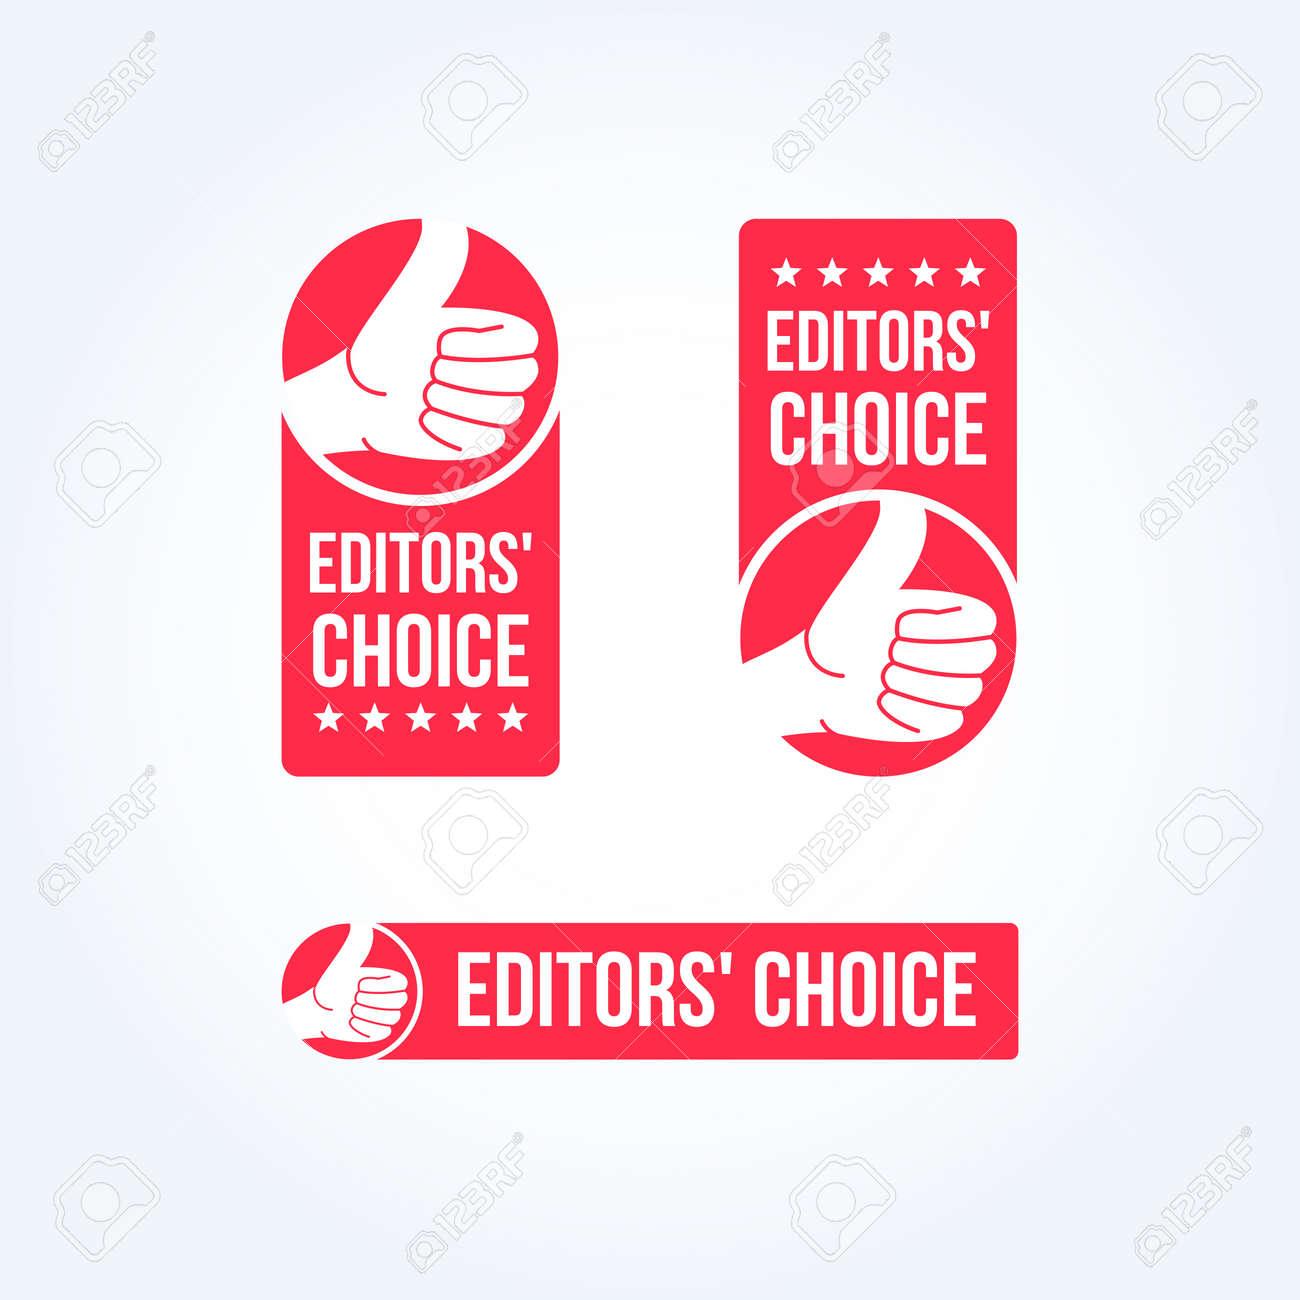 Editors' Choice Labels - 55387265